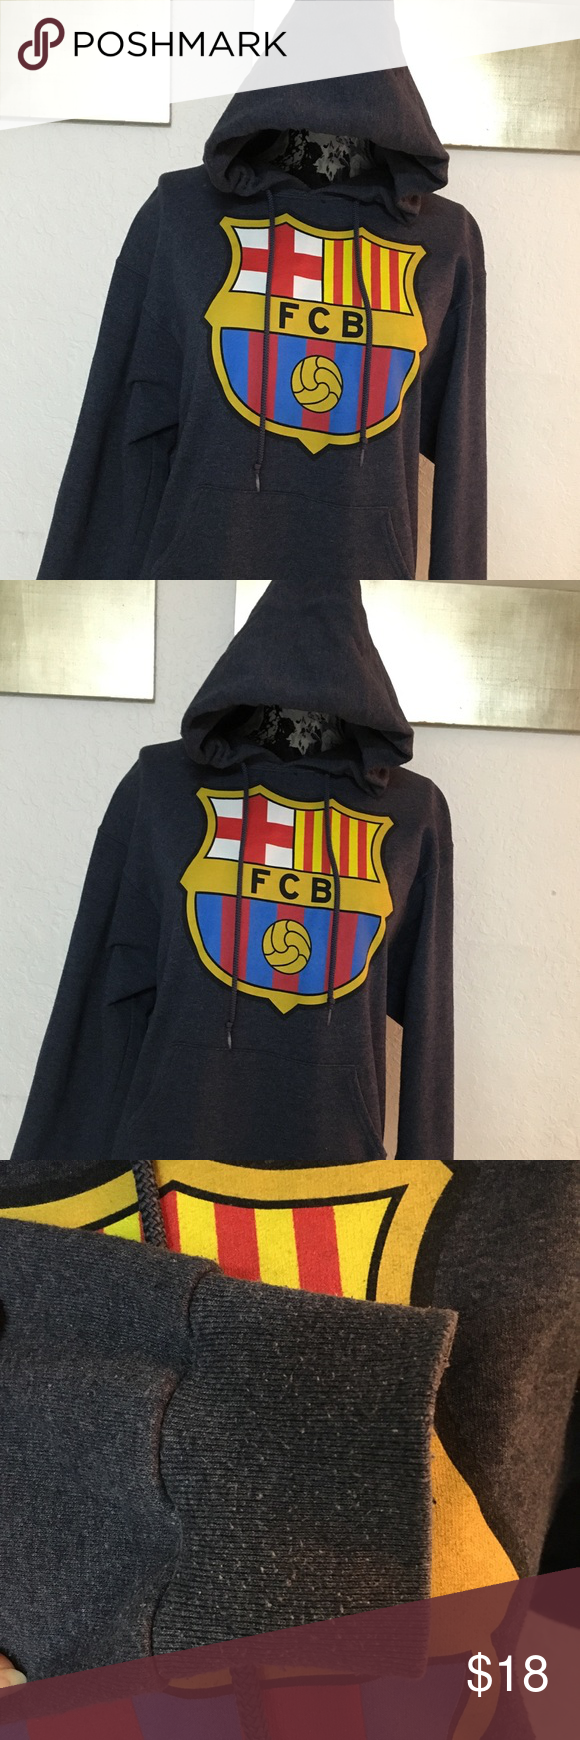 enmarcar una camiseta fcbarcelona fans fcb pinterest